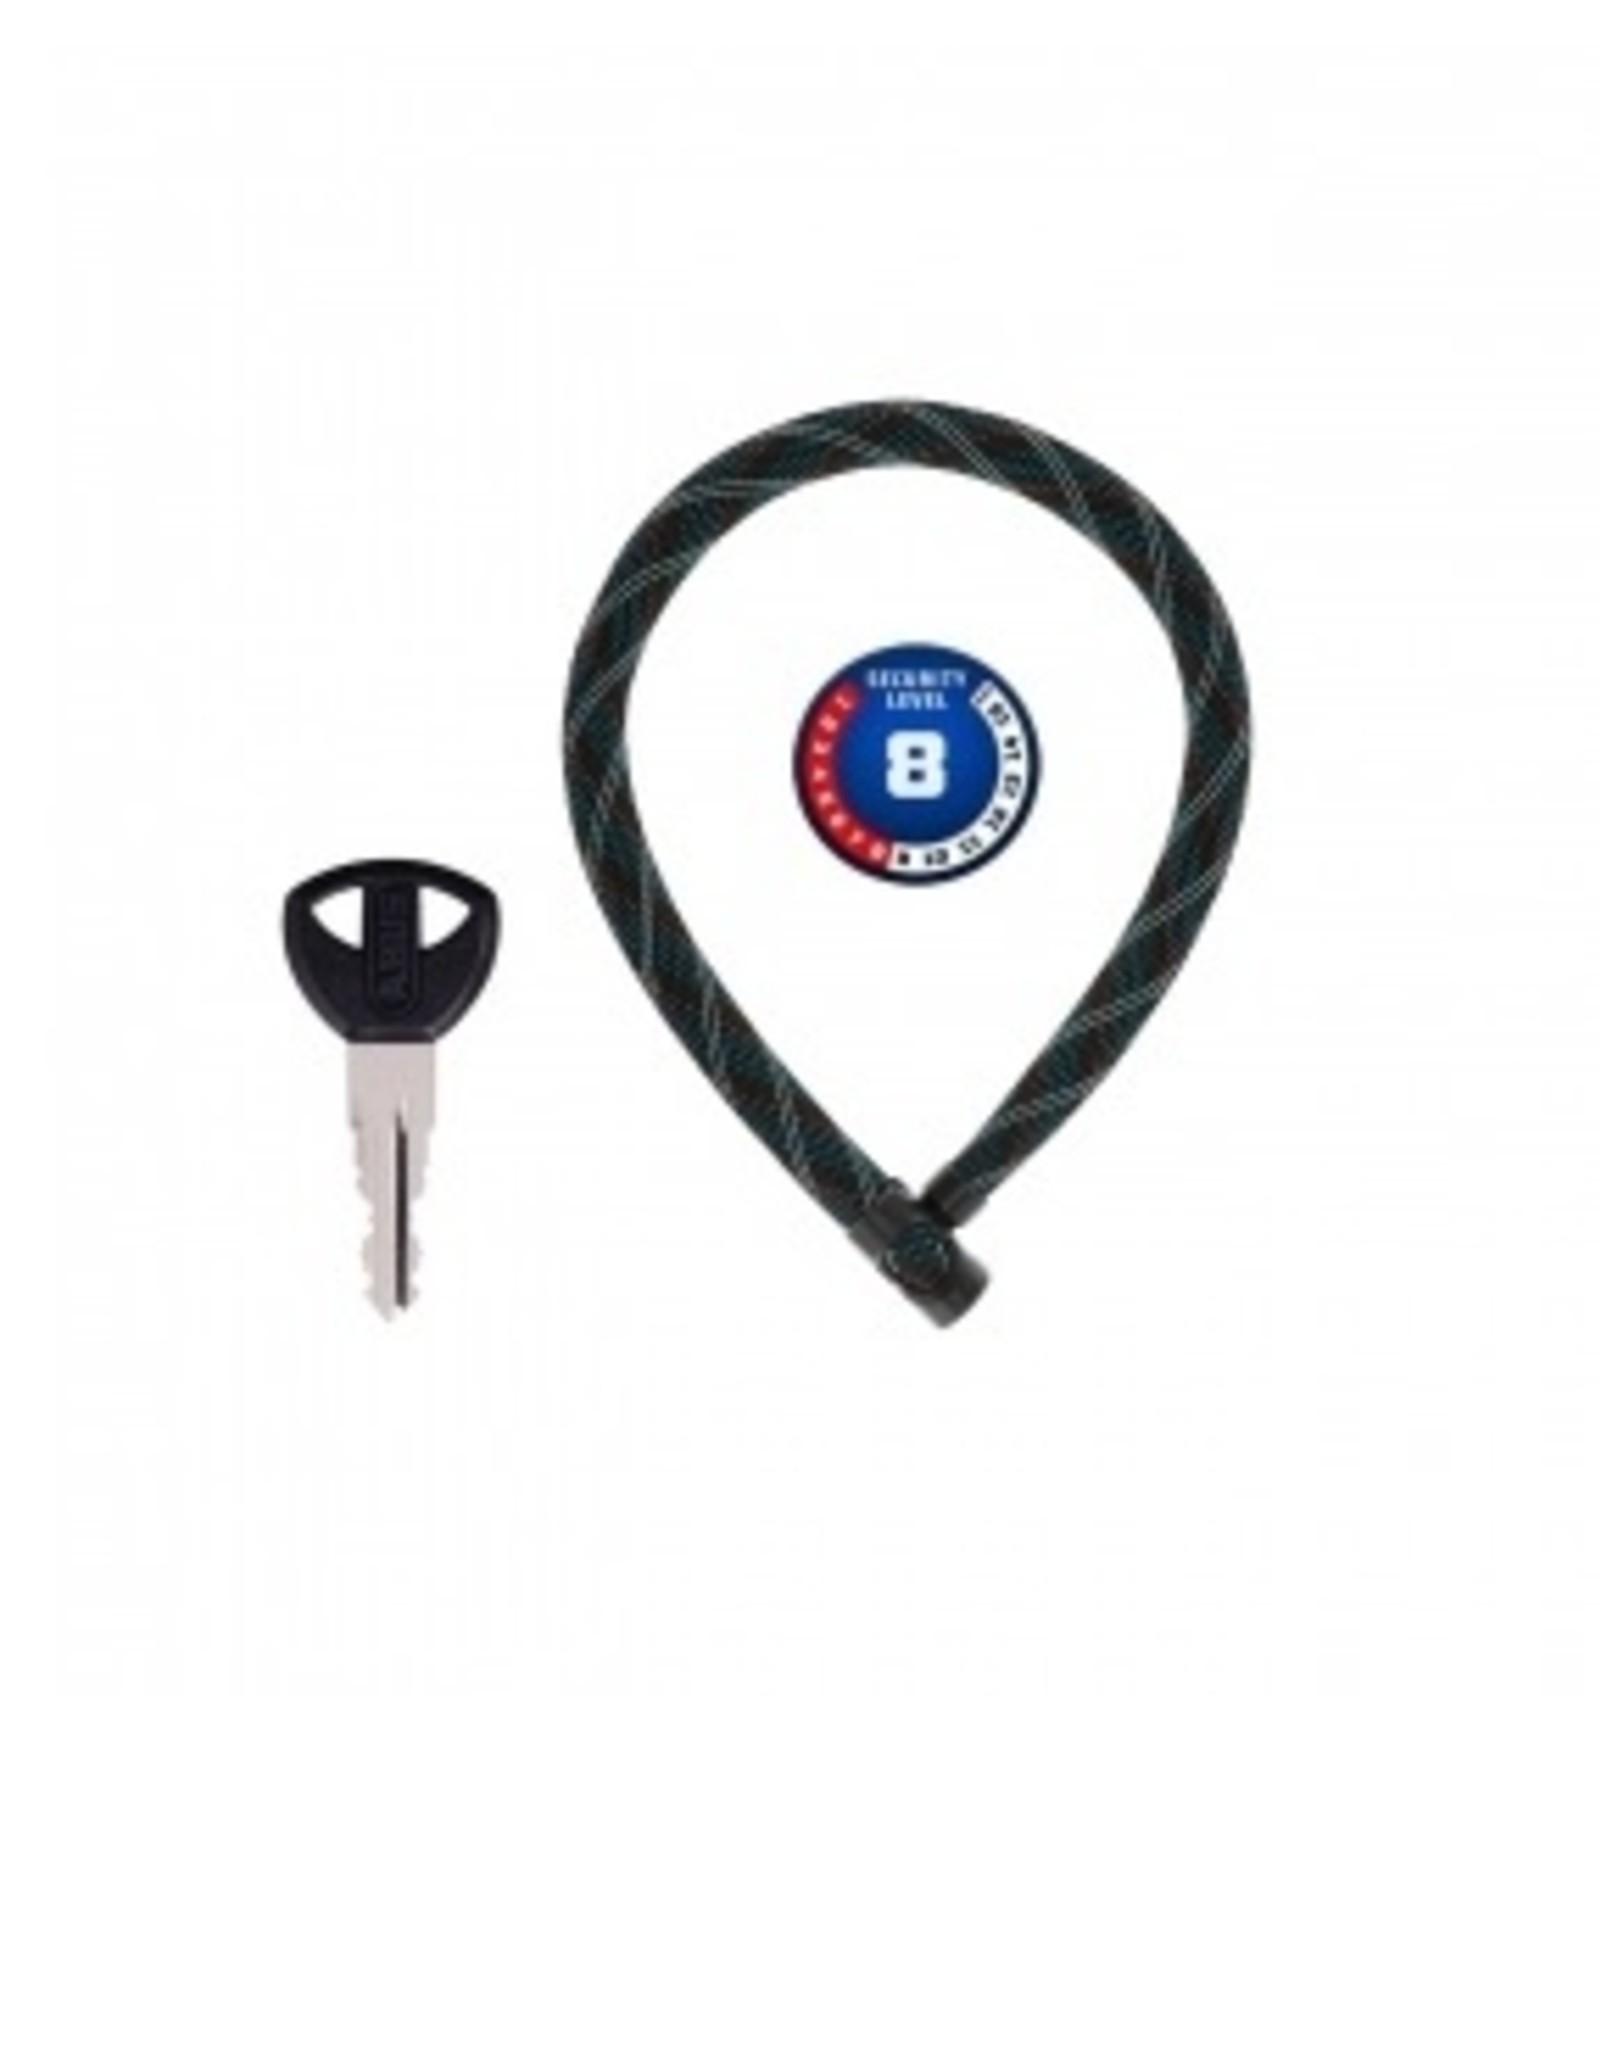 Lock - Ivera 7210 3.6ft Chain Grey